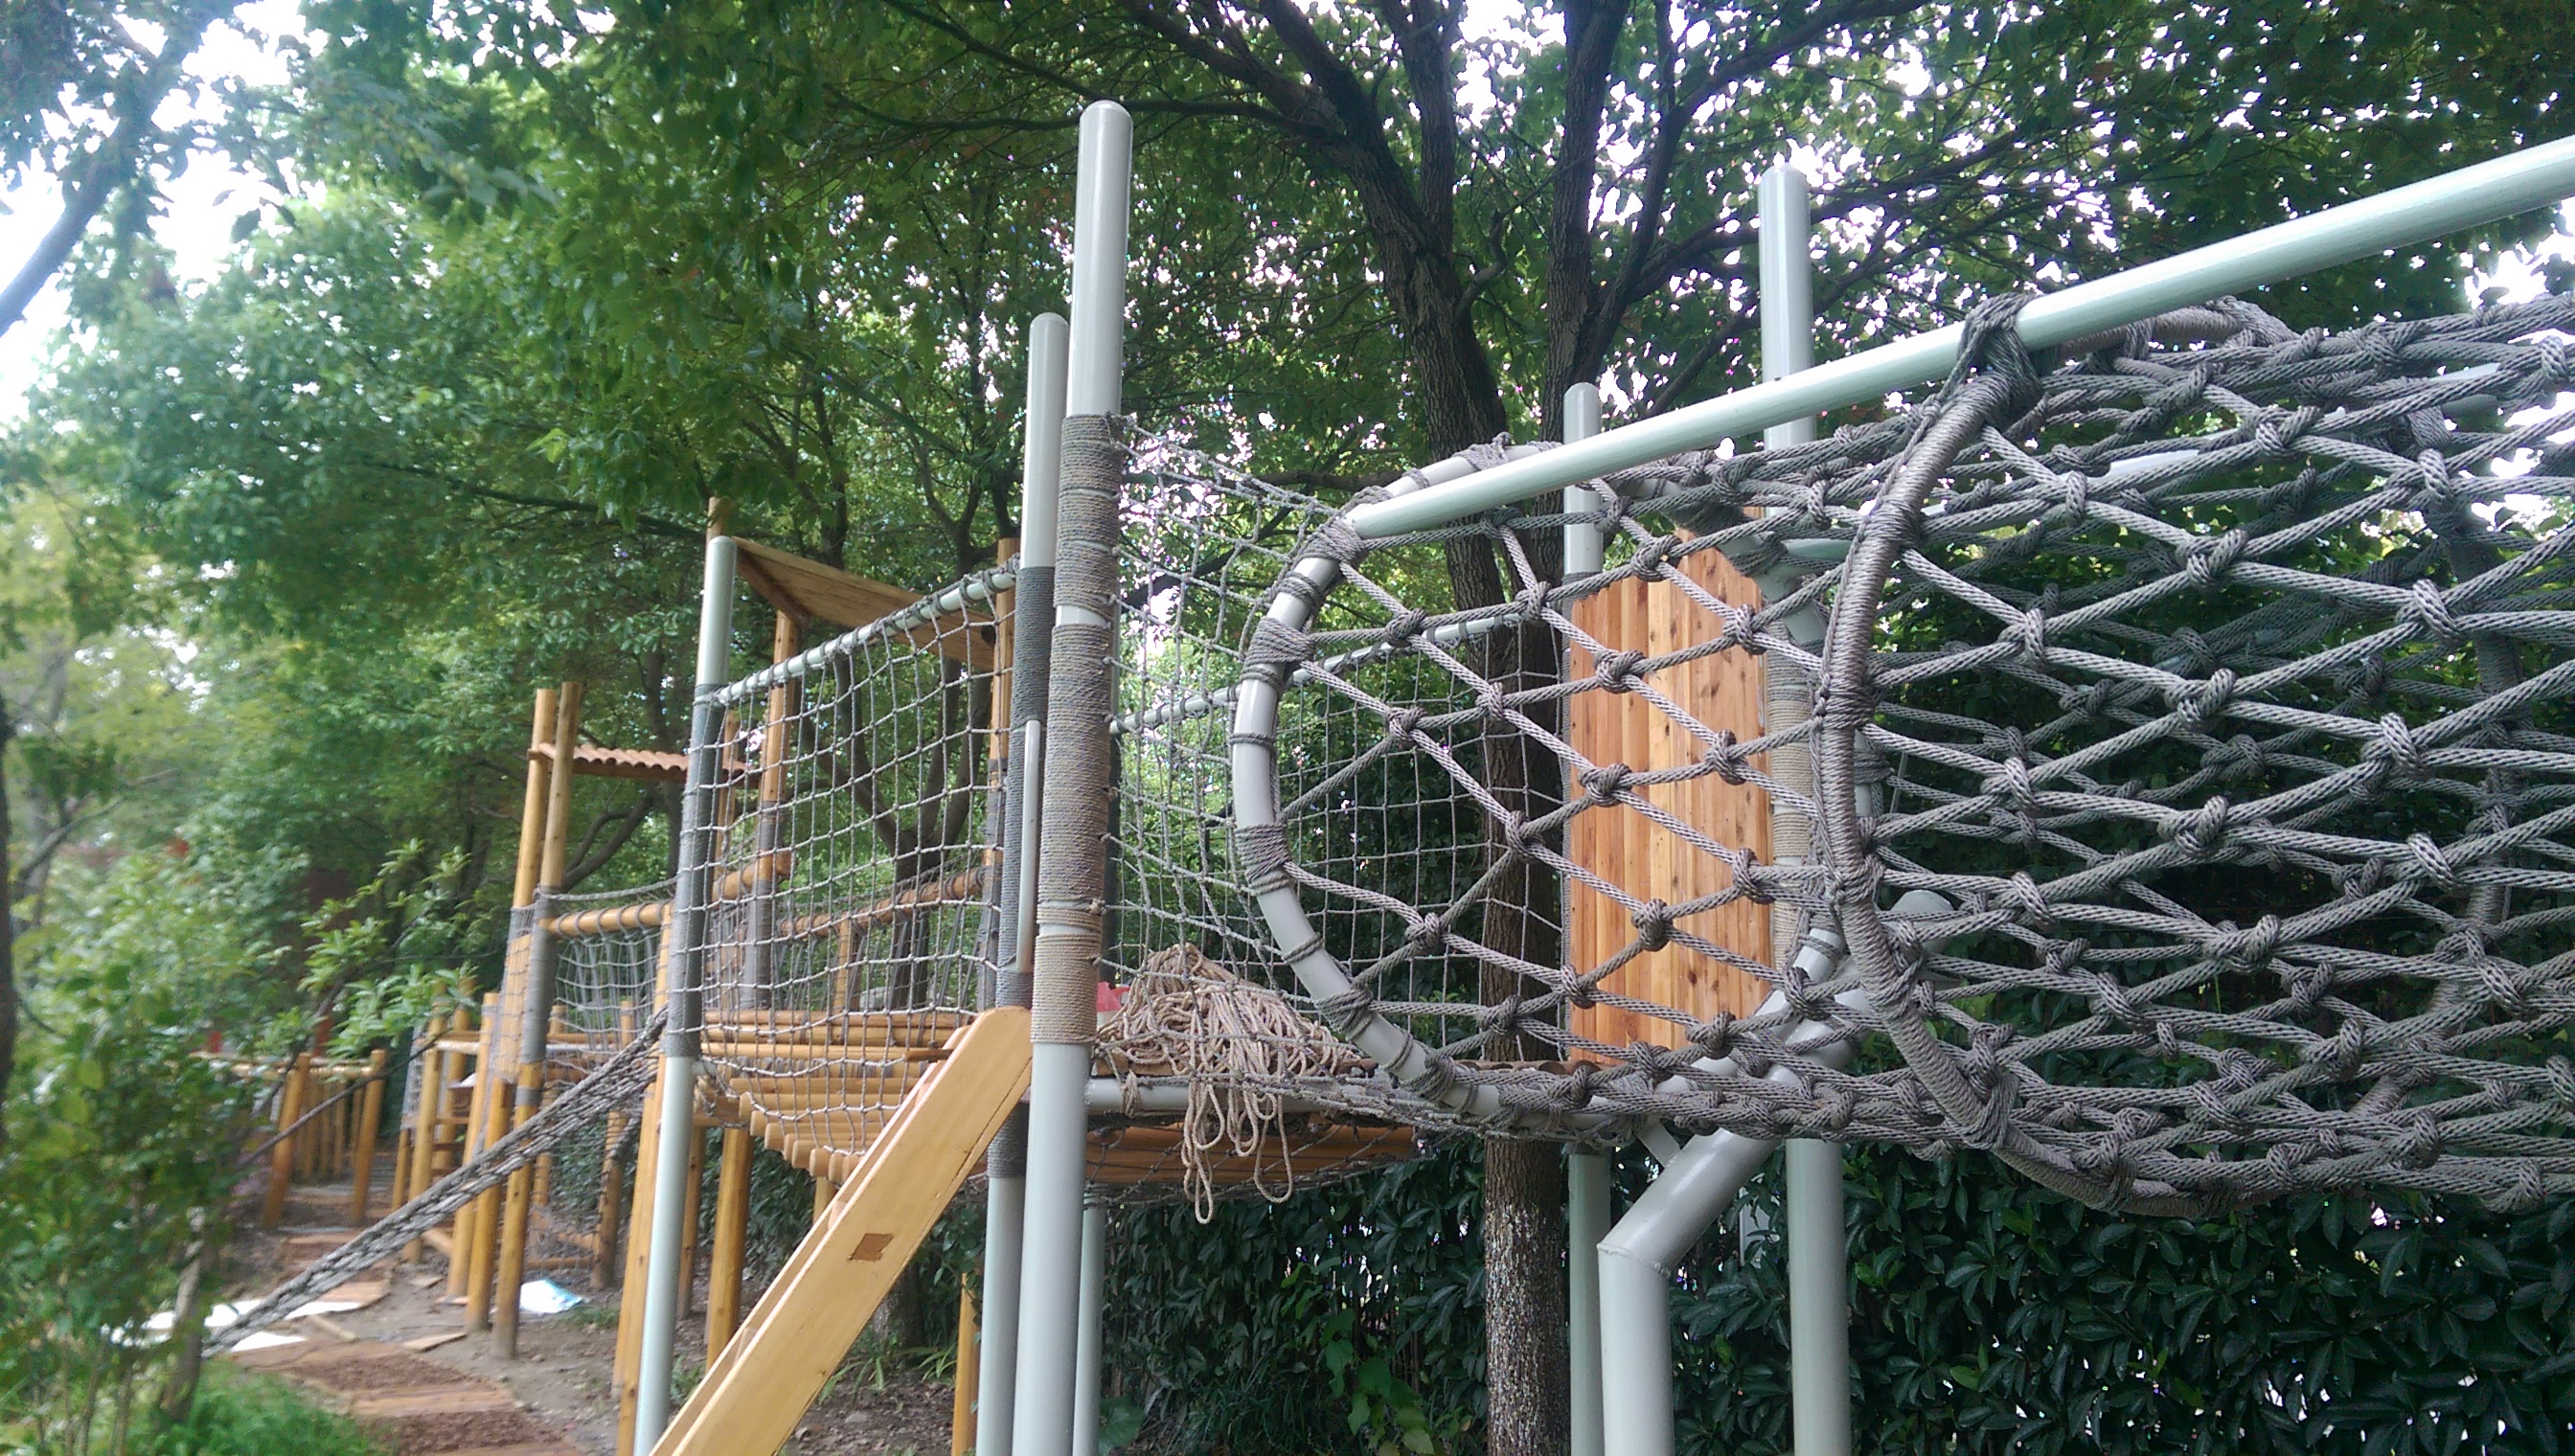 Popular Playground Kids Climb Safety Rope Net Climb